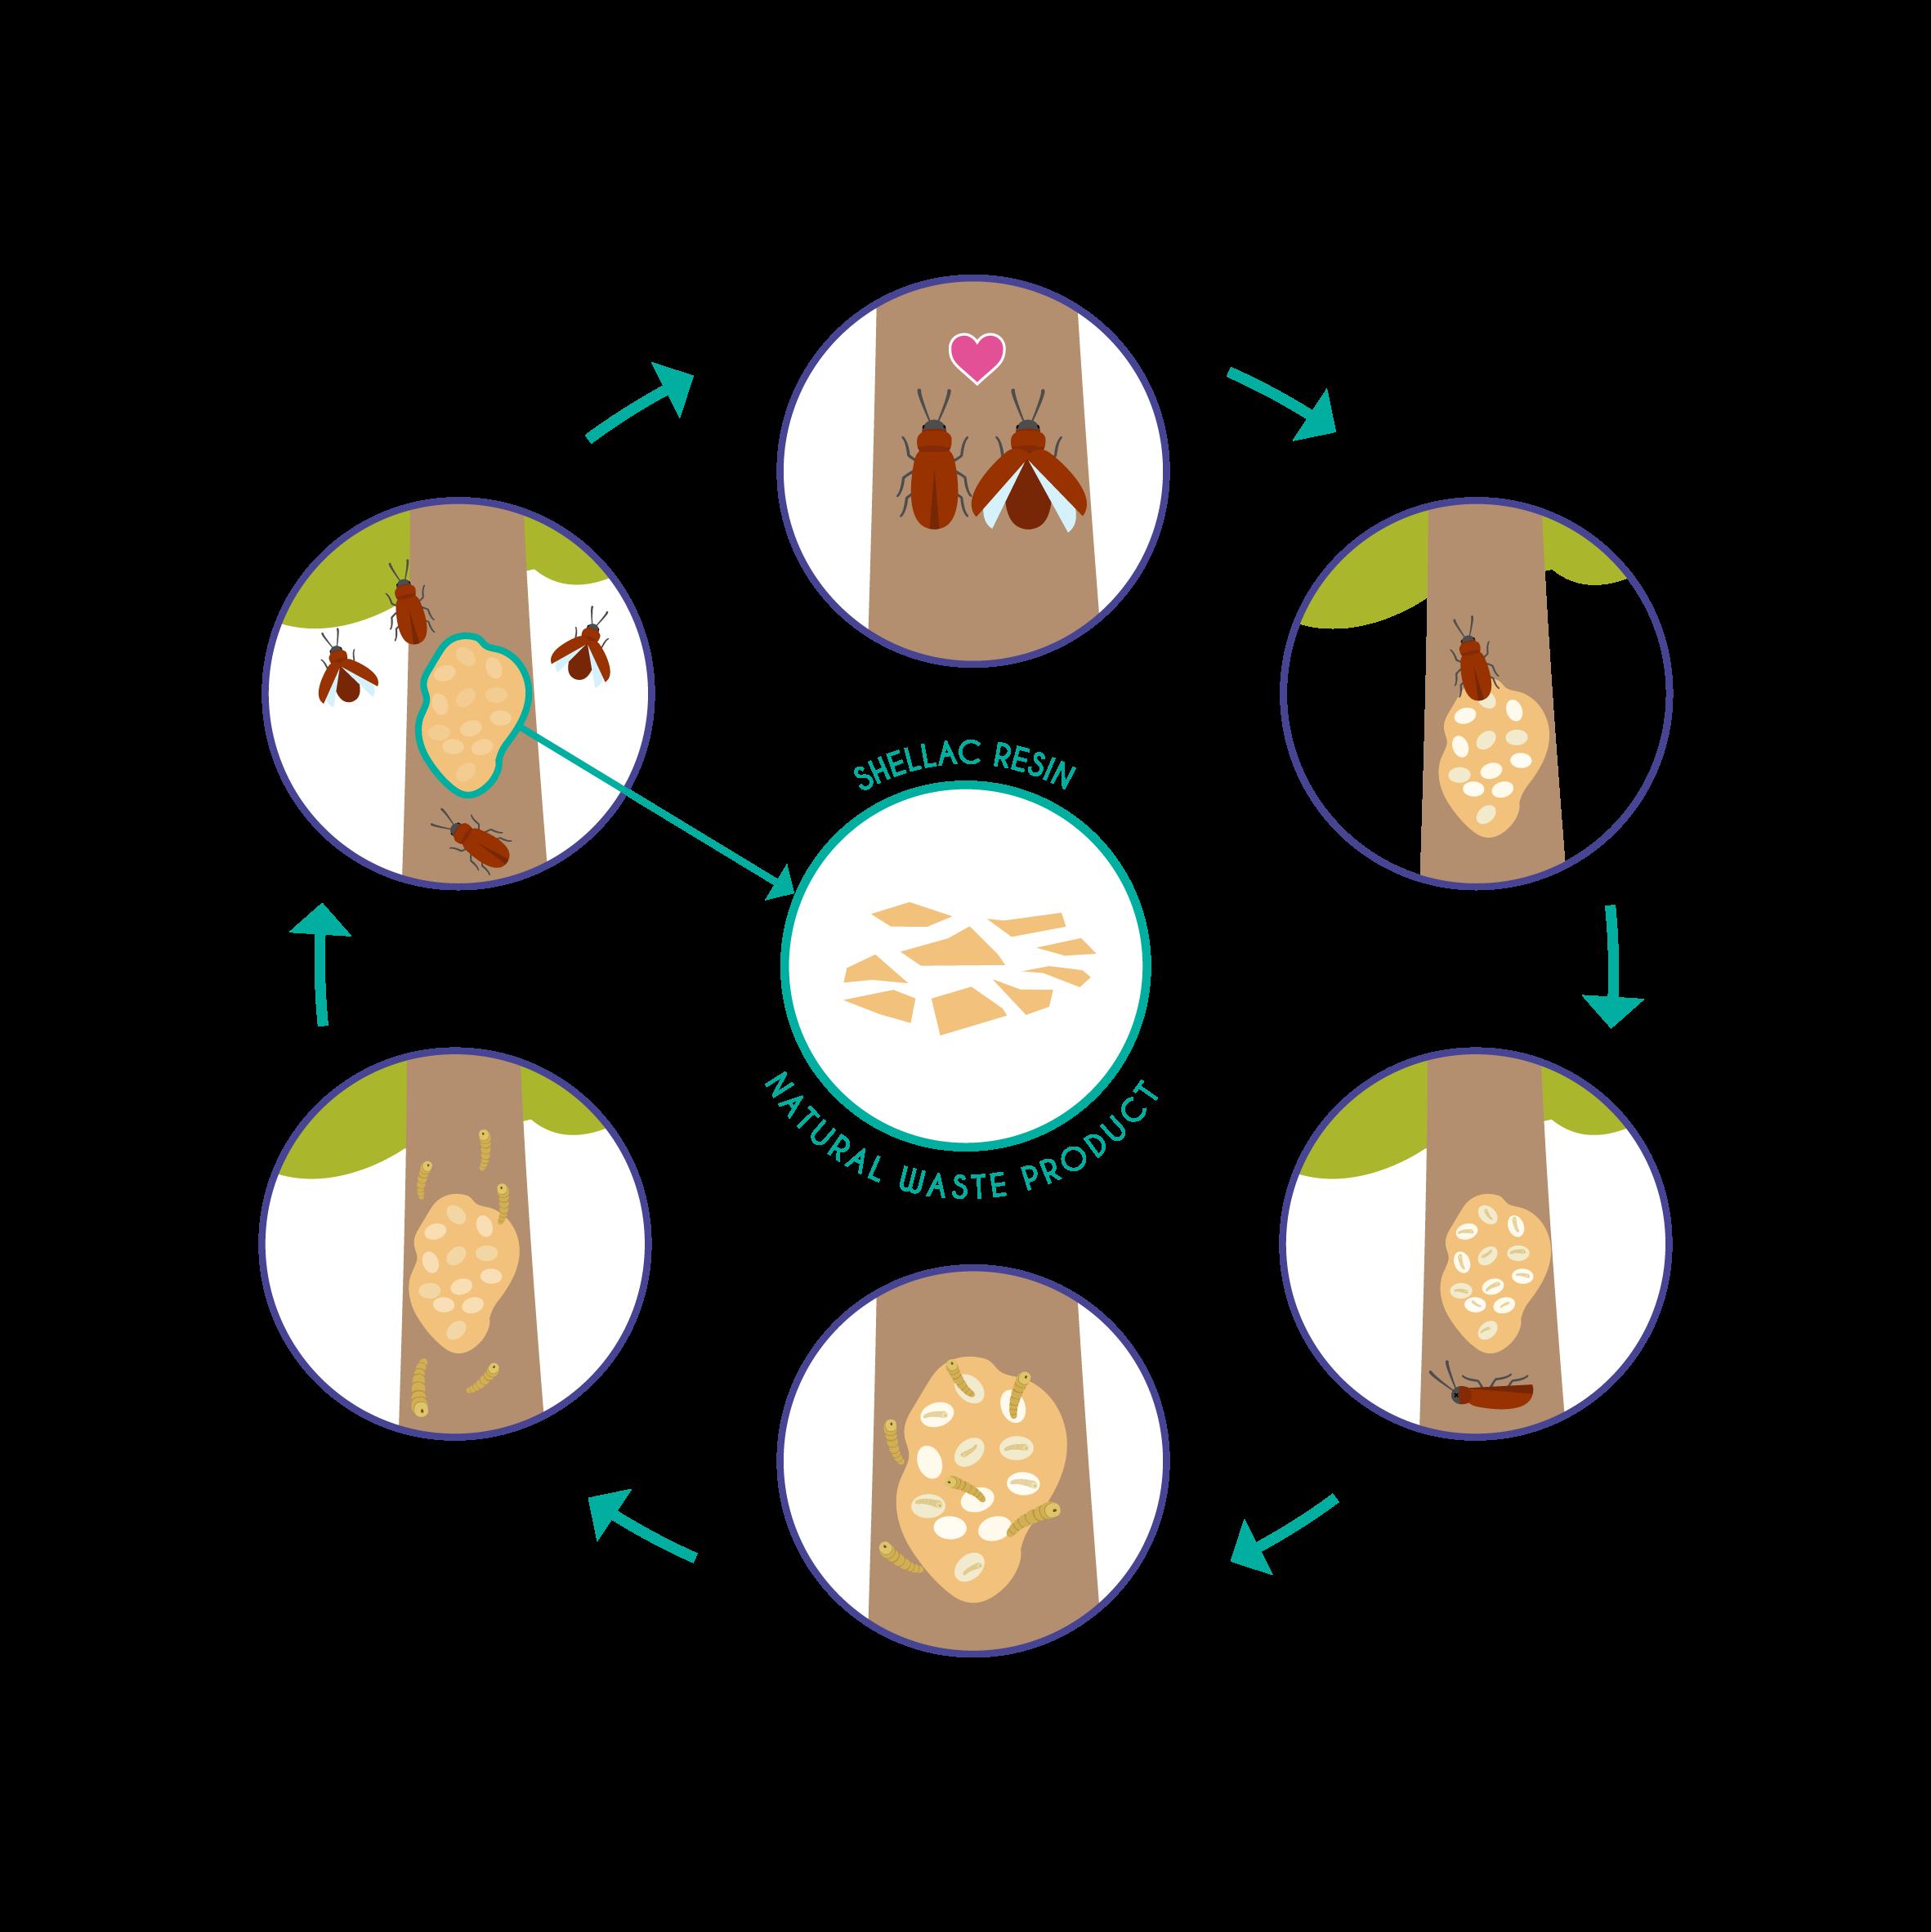 Shellac process